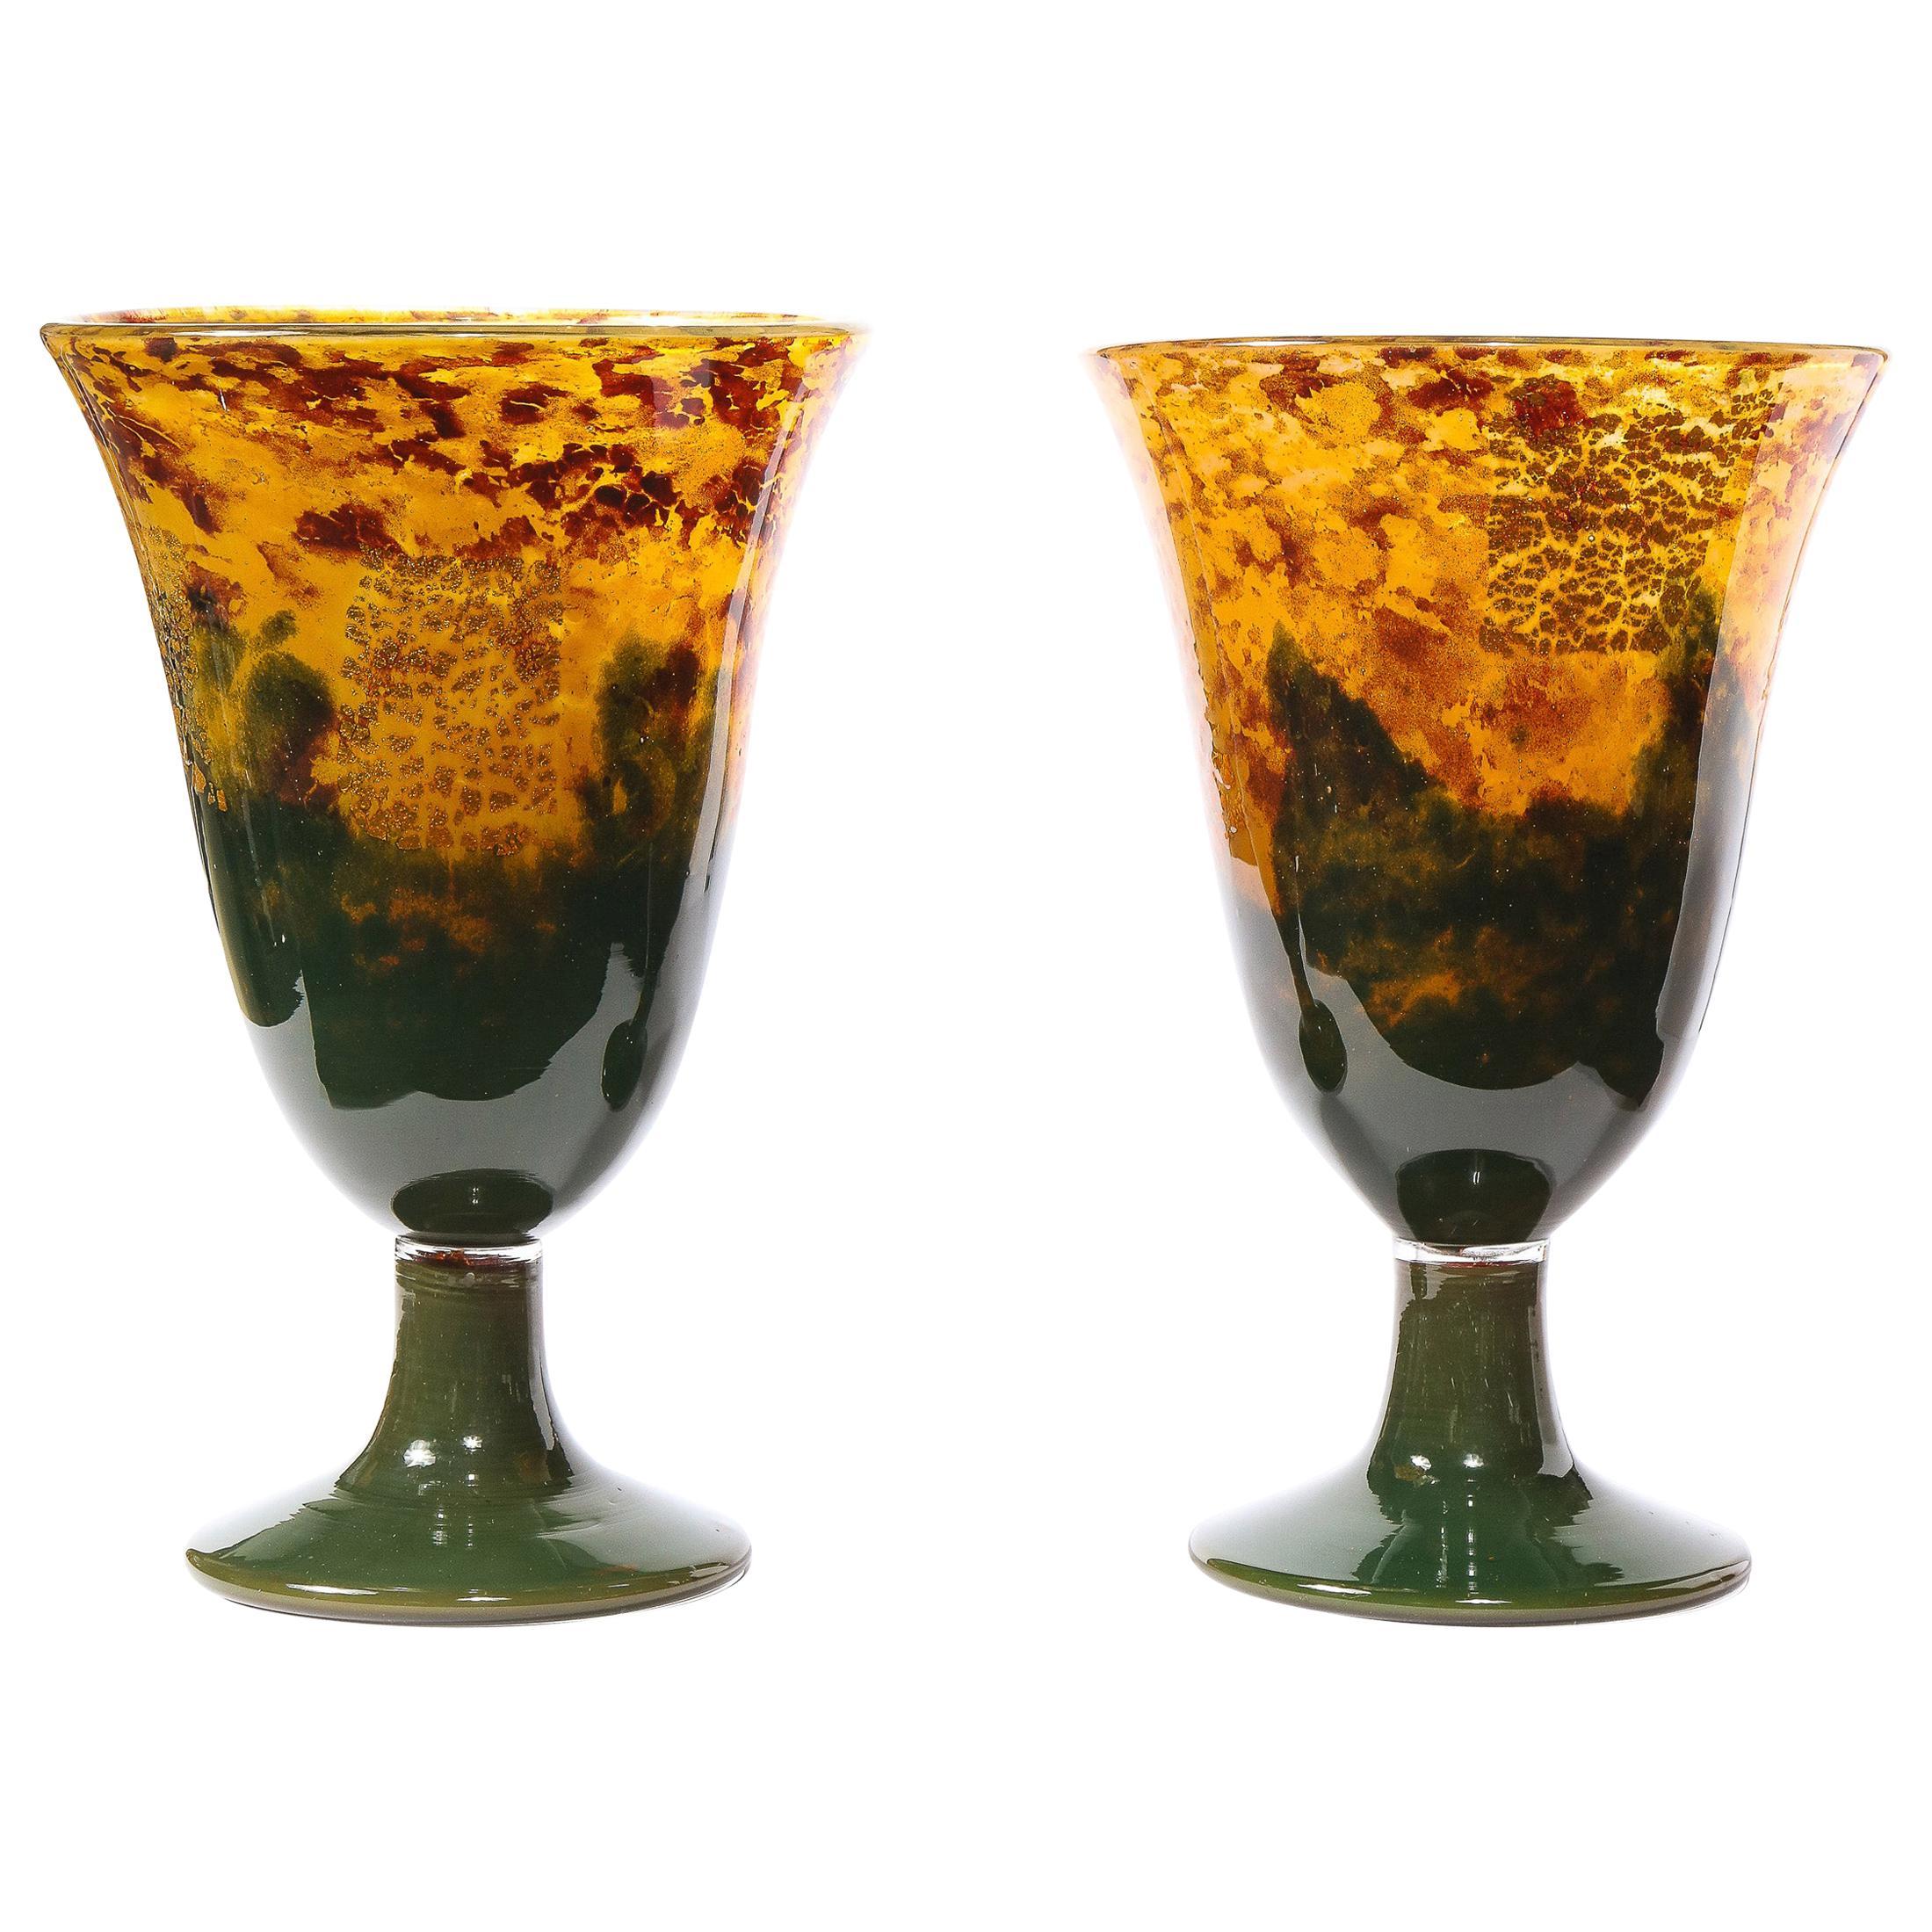 Pair of Art Deco Handblown Ruby, Saffron & Emerald Vases Signed Daum Nancy